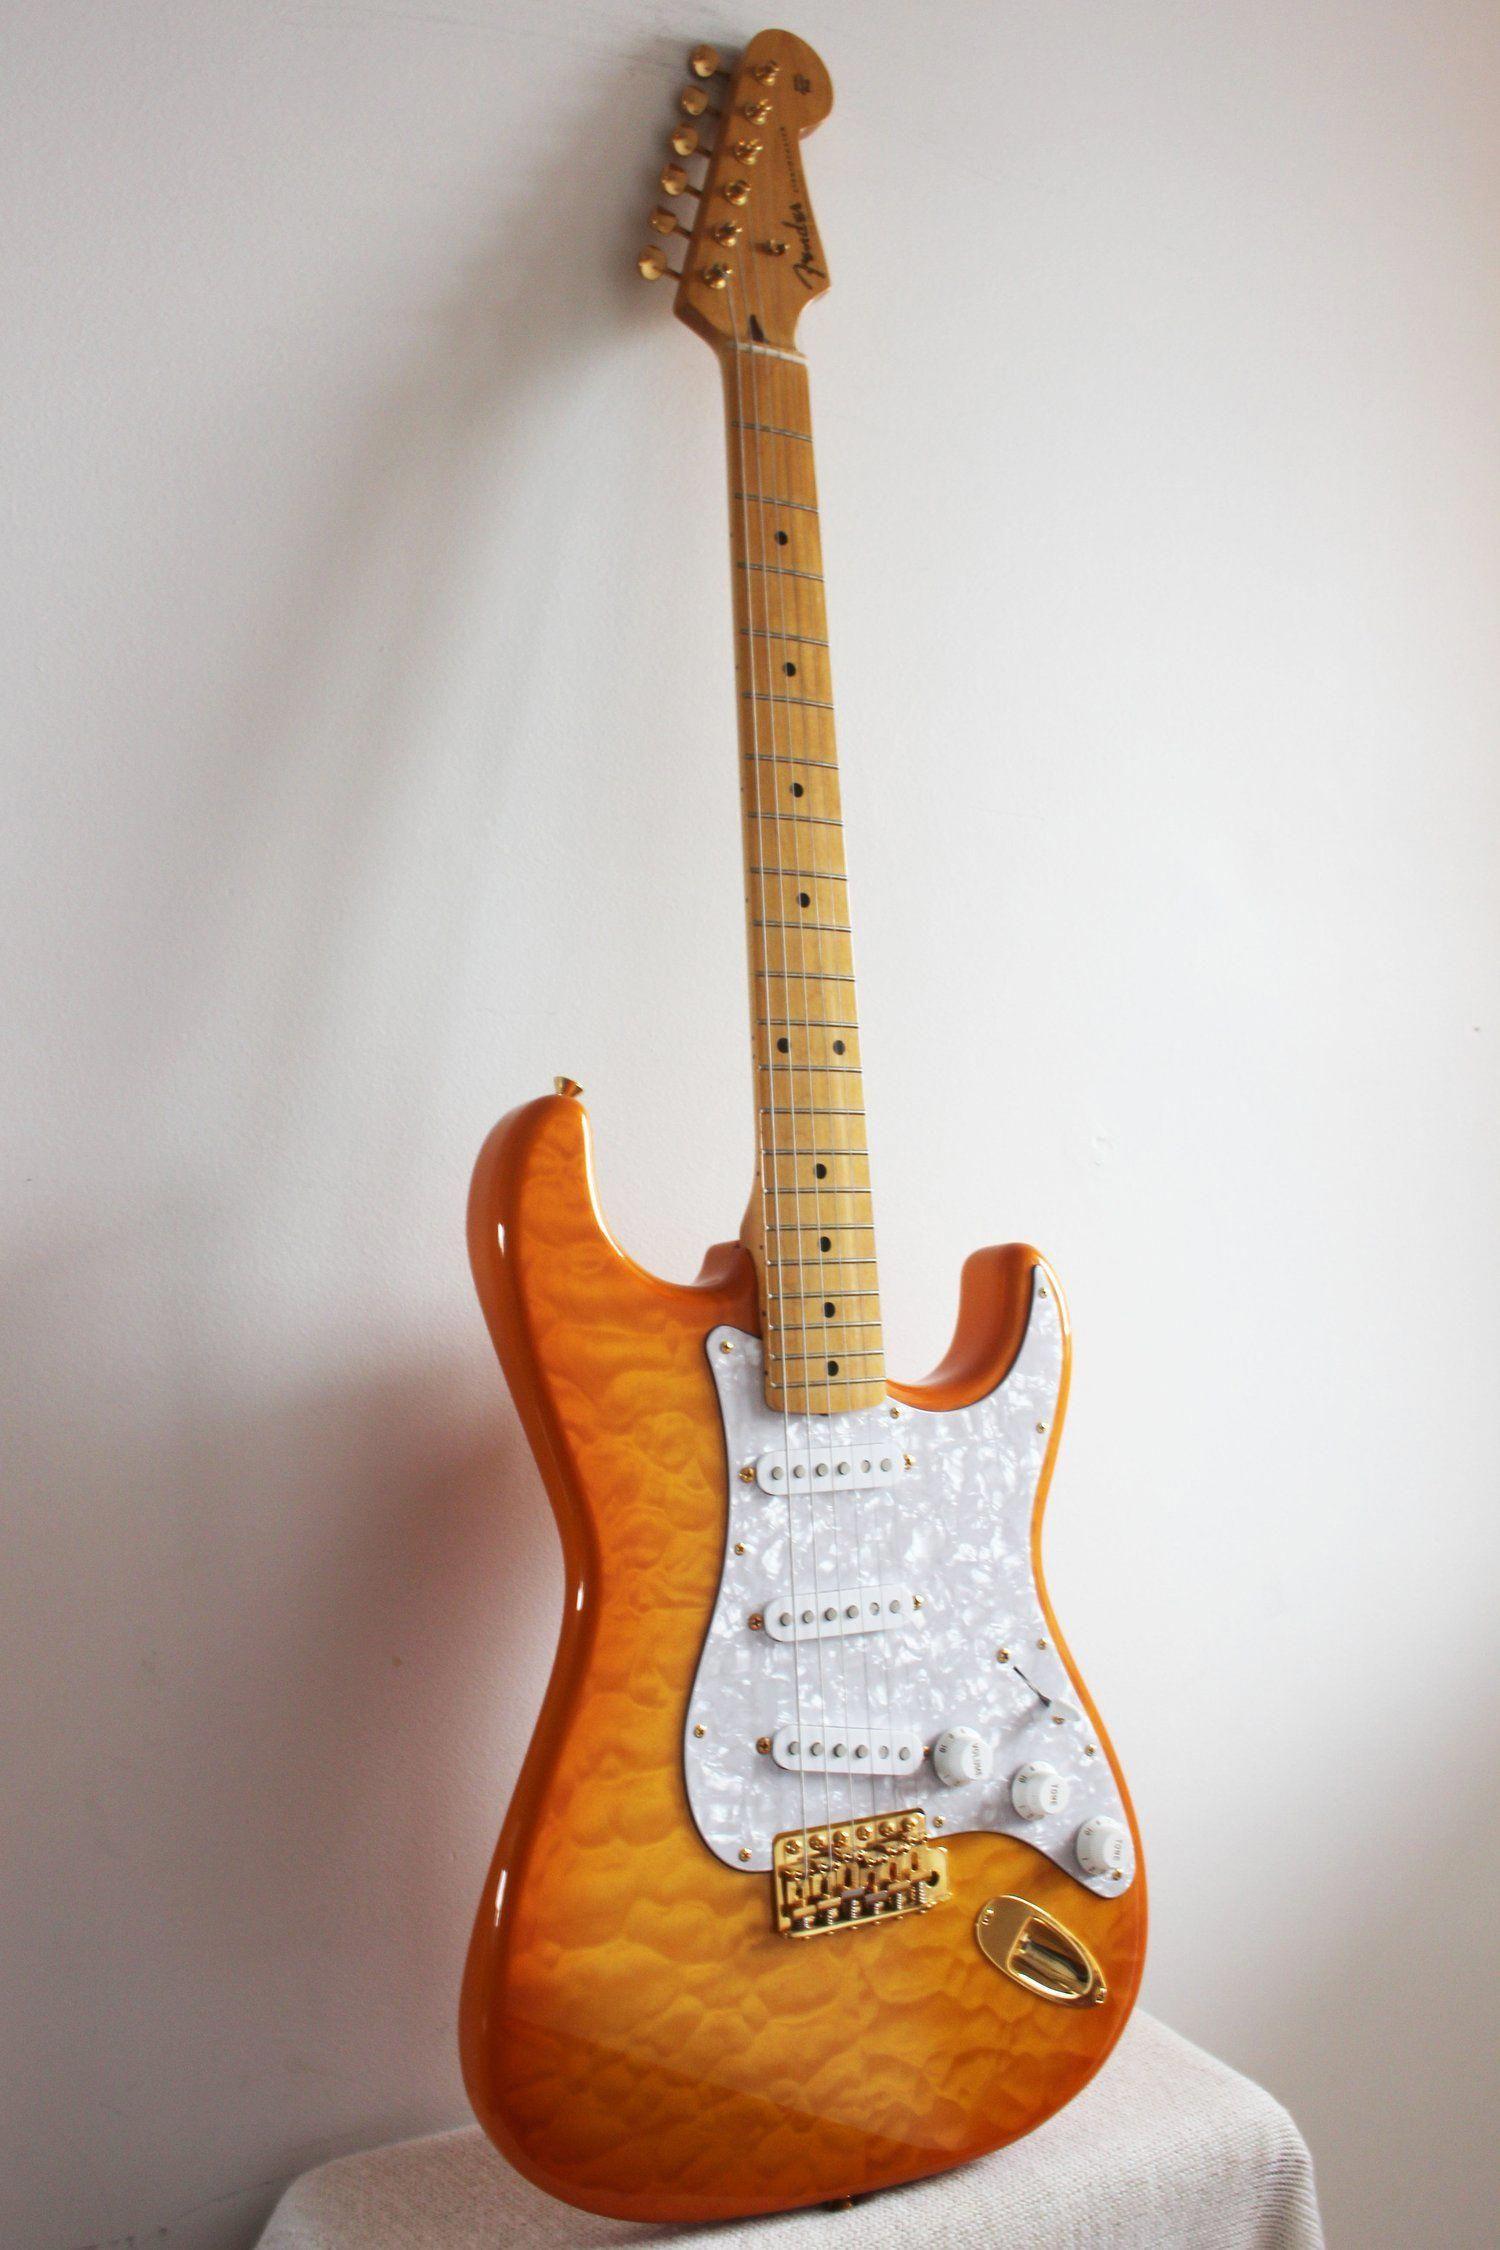 23 Amazing Fender Guitar Wall Art Fender Guitar Wall Art Guitars Guitarporn Fenderguitars Fender Stratocaster Stratocaster Guitar Fender Guitars